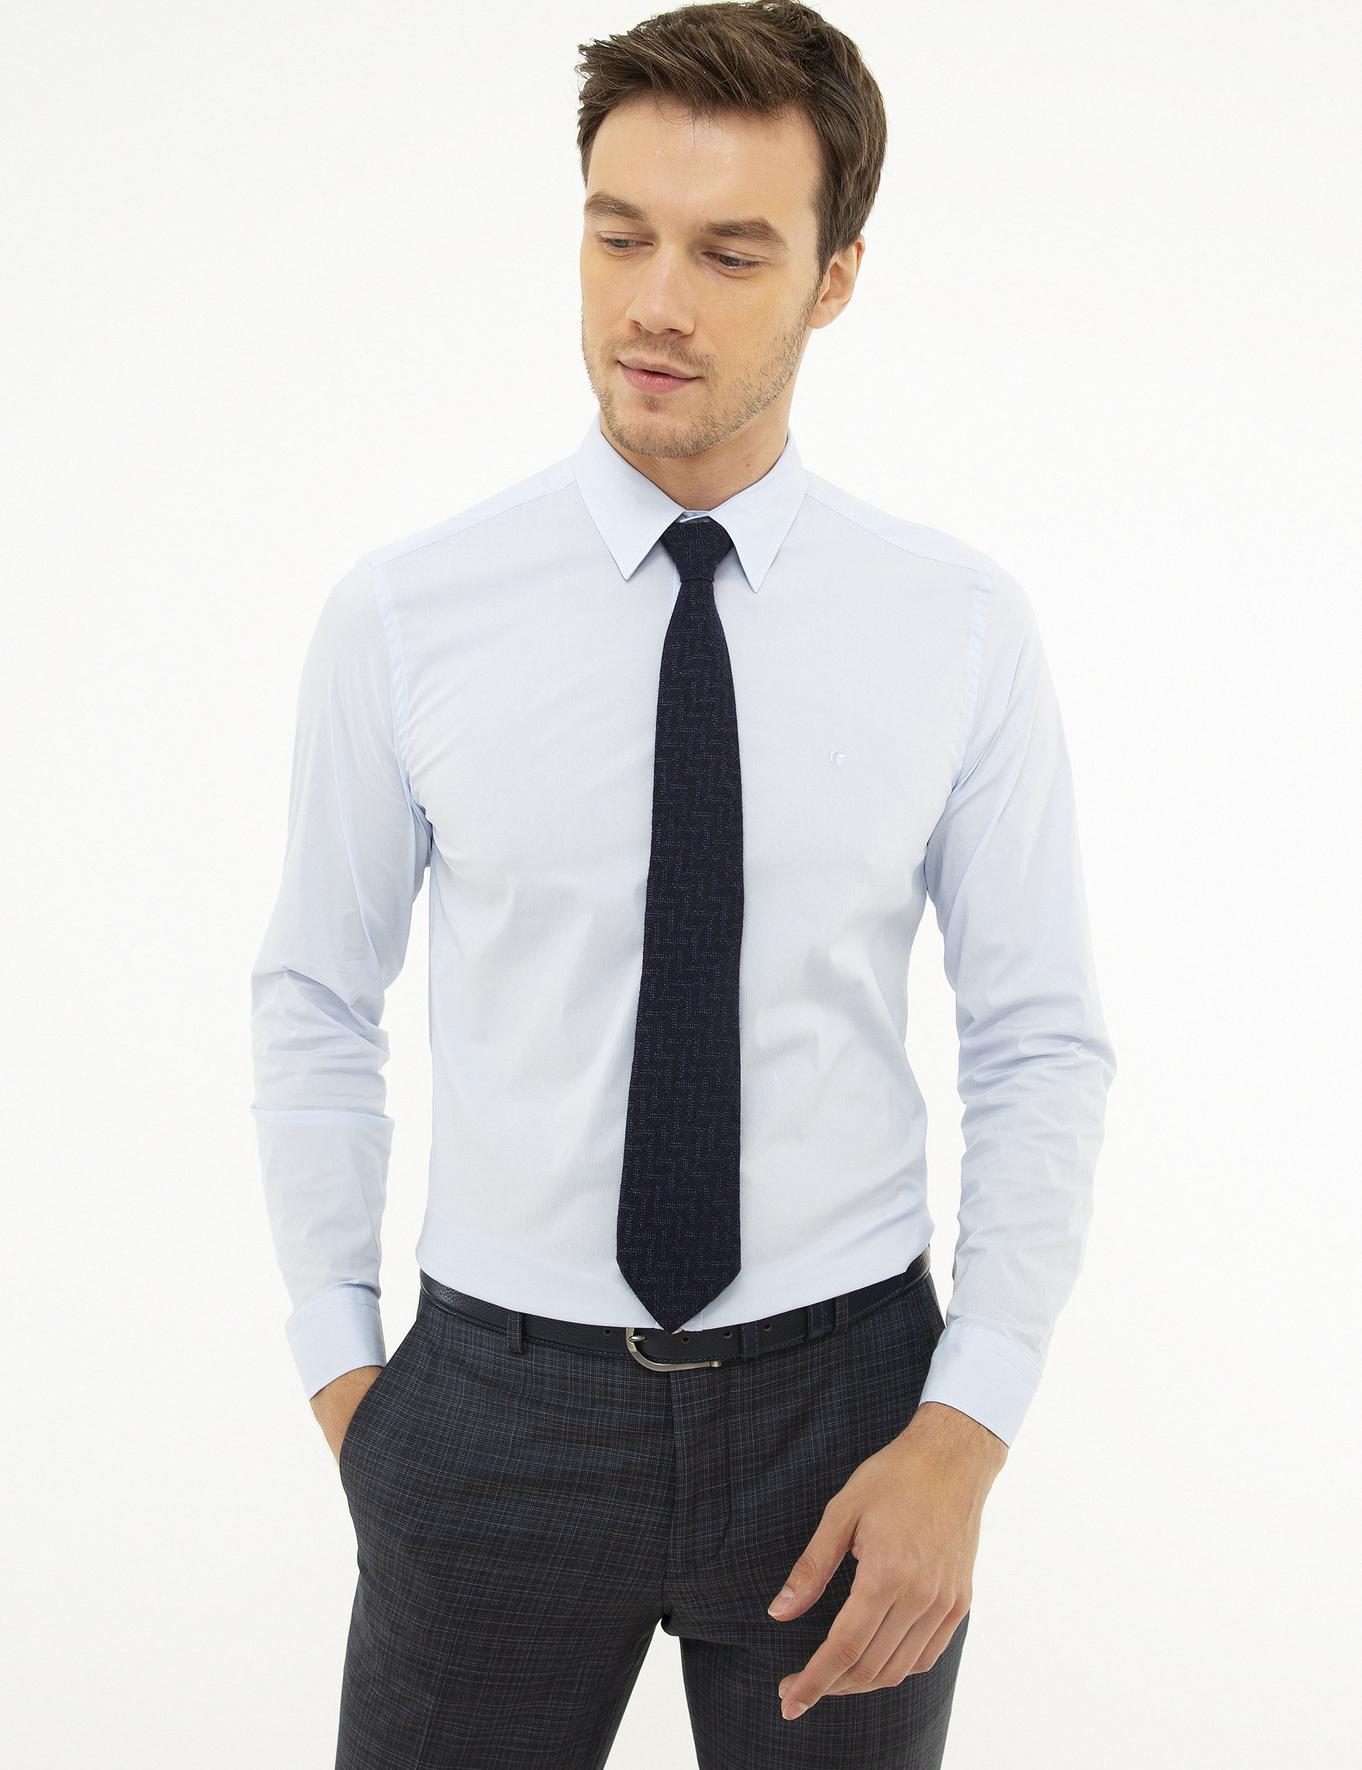 Açık Mavi Slim Fit Gömlek - 50219616004